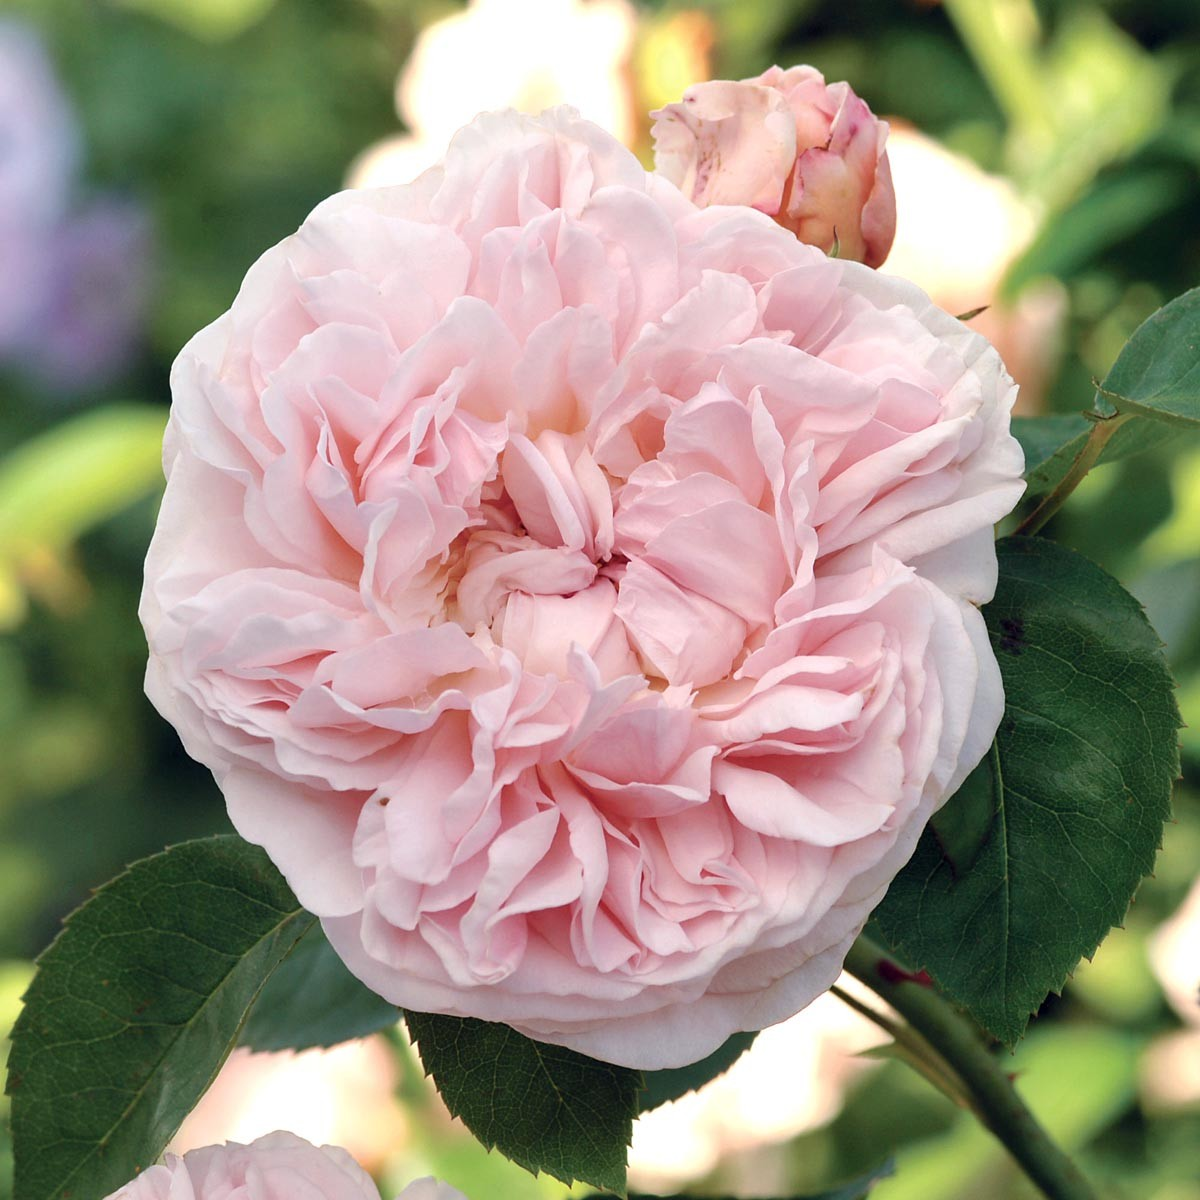 St. Swithun Roses